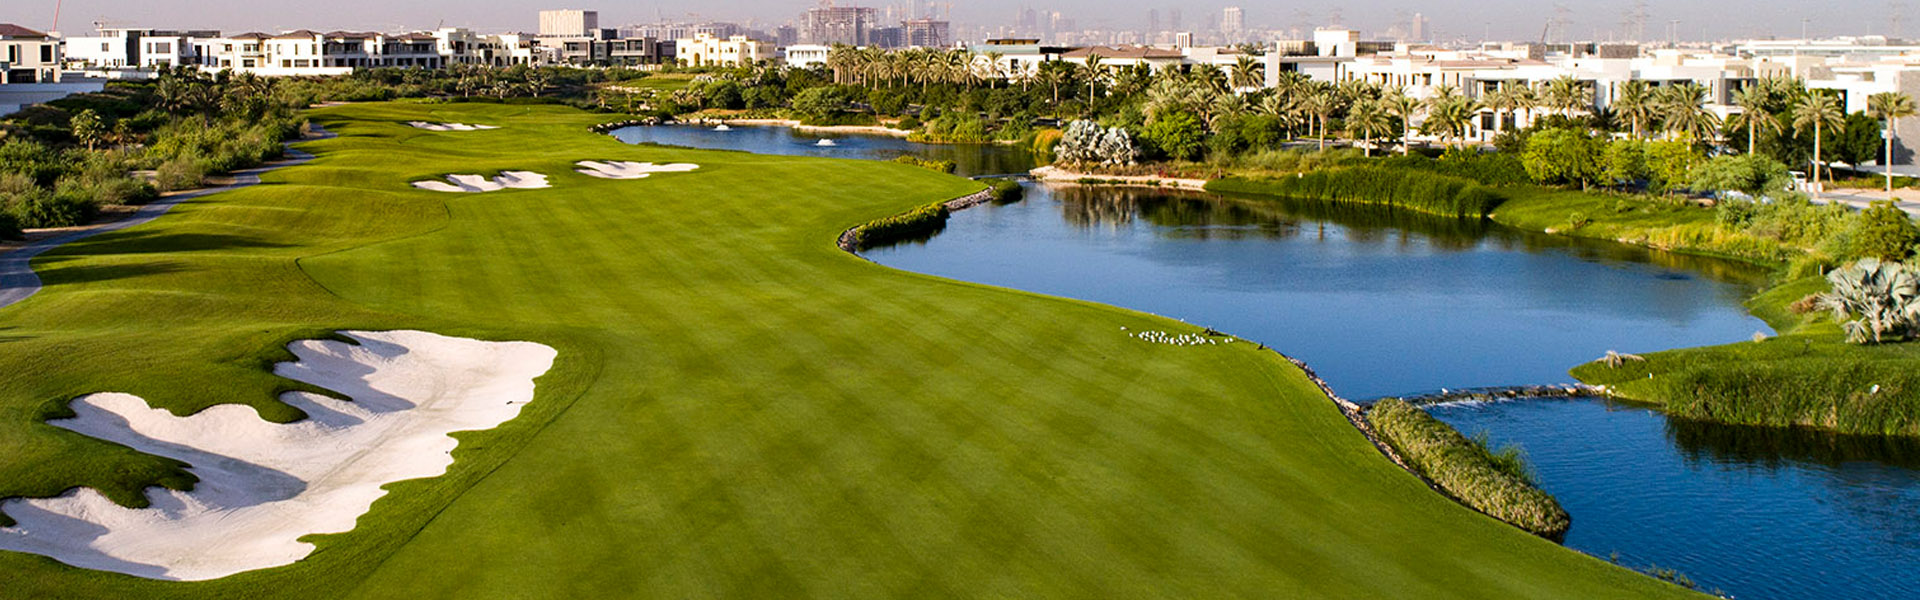 golf-image-home